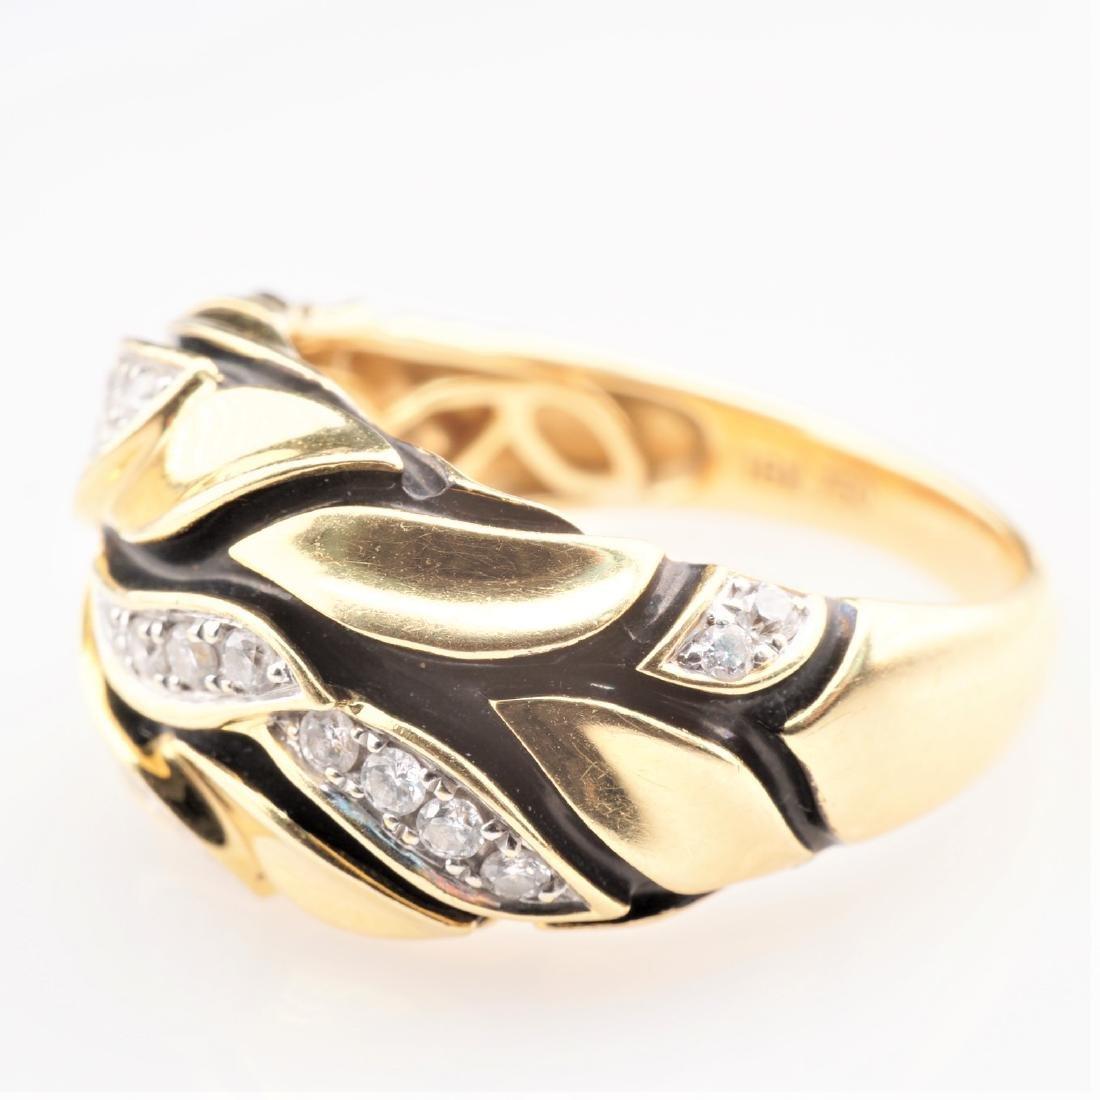 18K YG Enamel and Diamond Leaf Ring sz 7 - 5